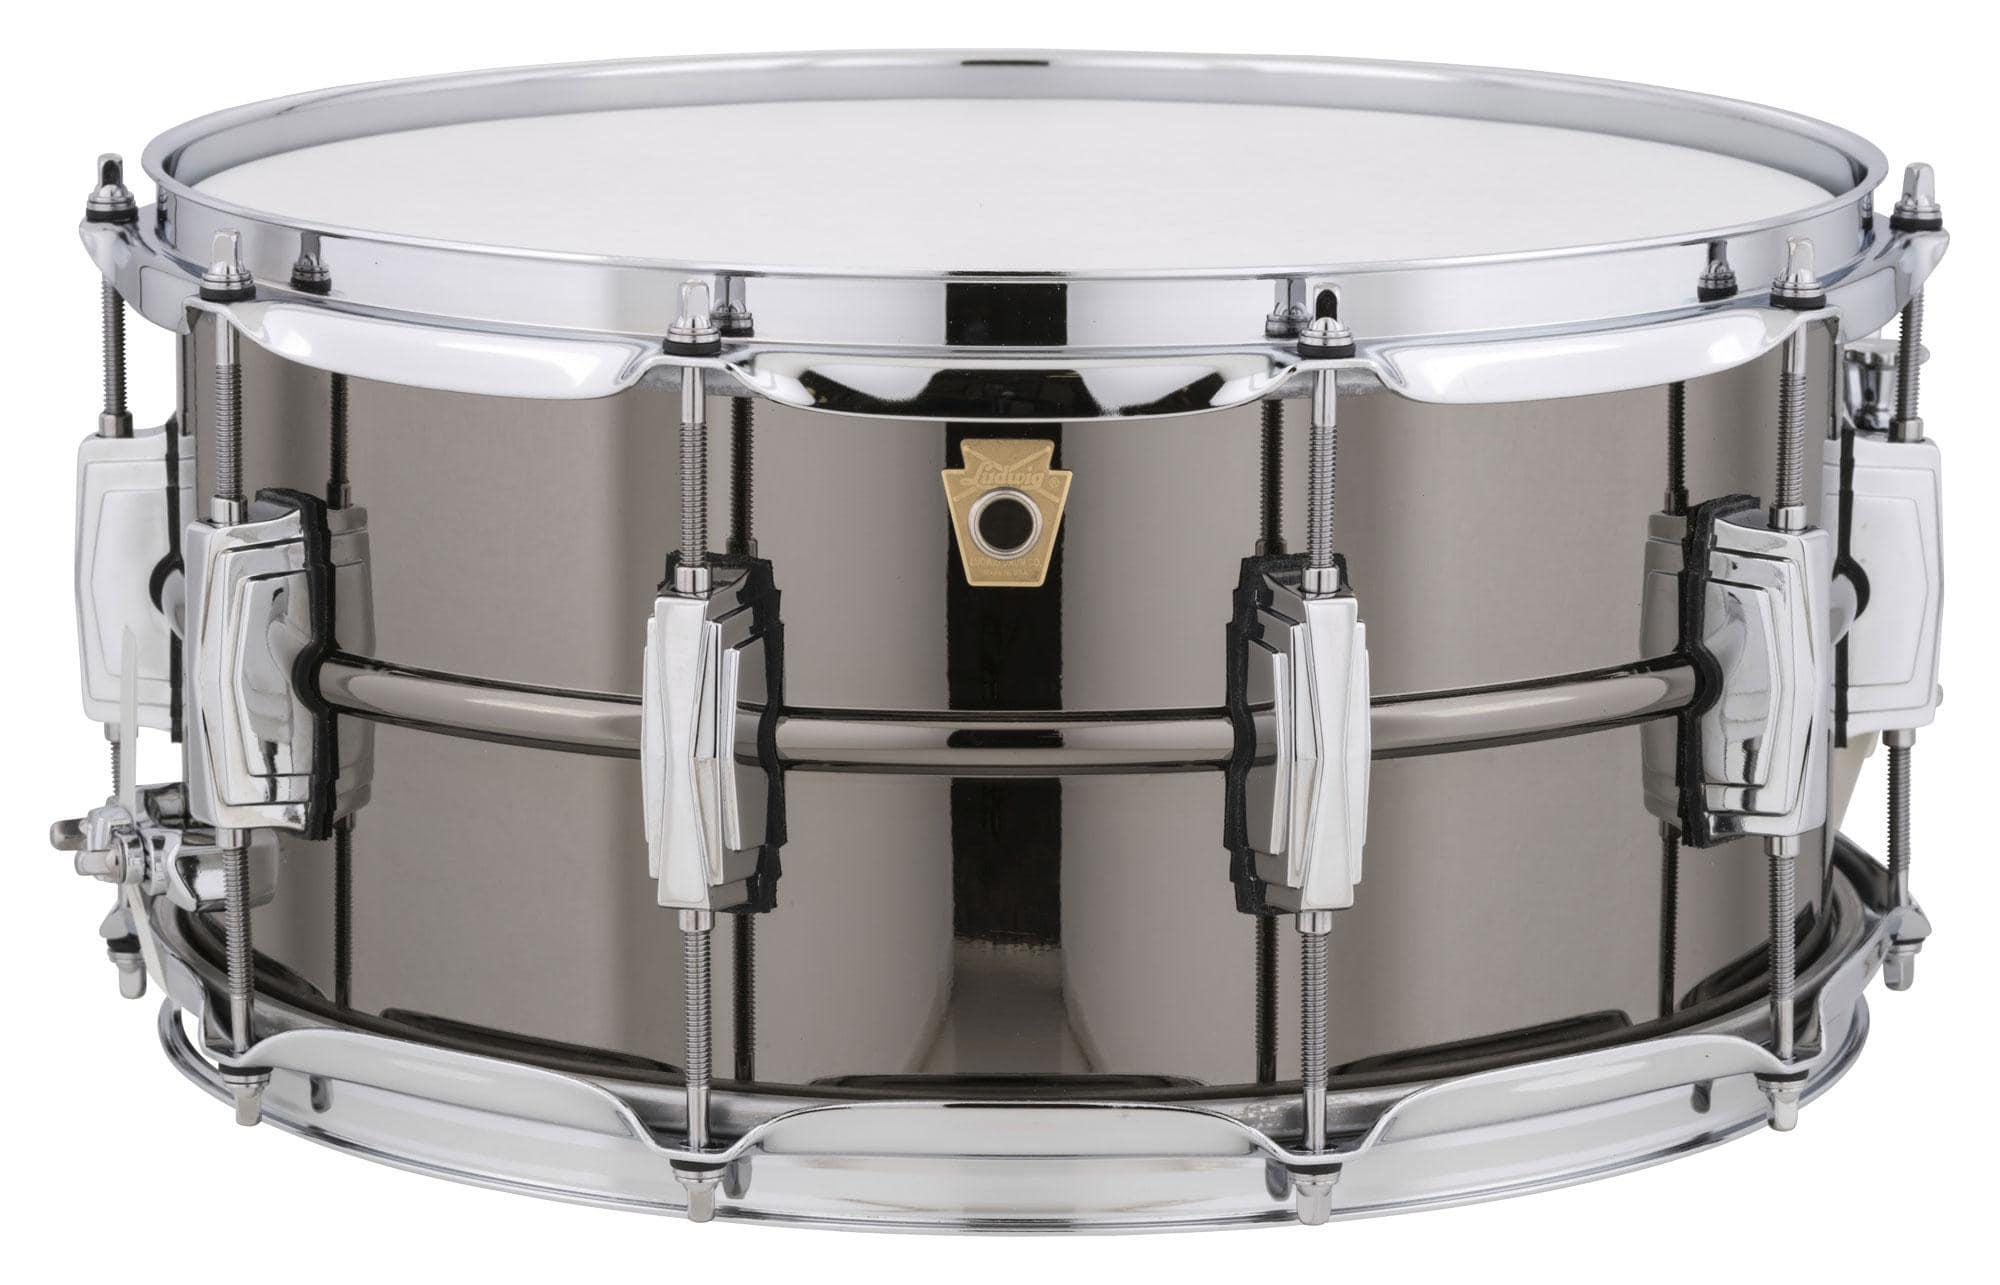 ludwig lb417 black beauty snare drum 14 x 6 5. Black Bedroom Furniture Sets. Home Design Ideas